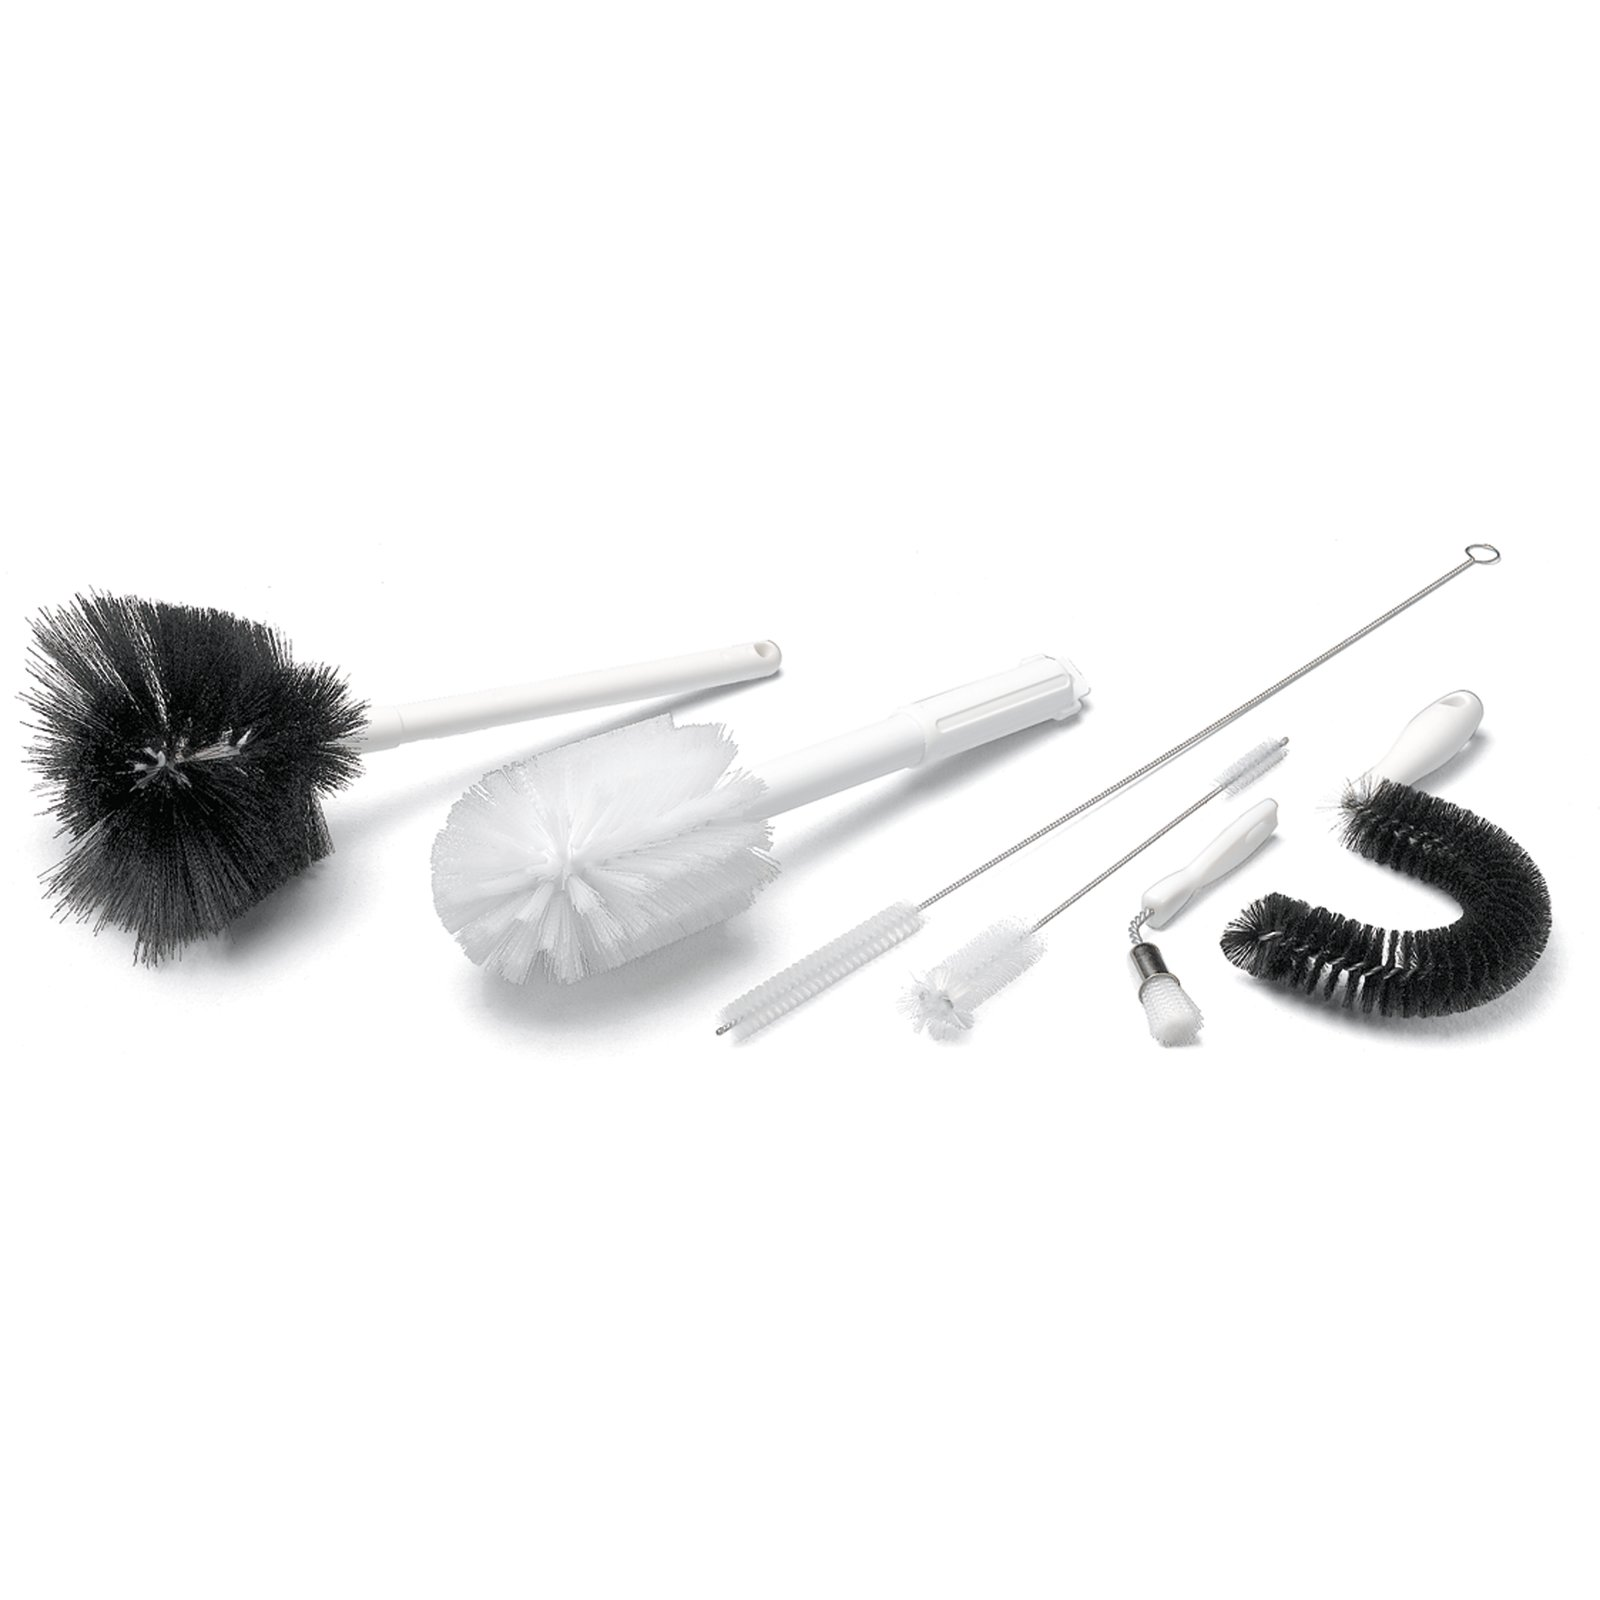 4067300 Sparta Handle Urn Brush W 5 8 Polyester Bristles 25 Carlisle Foodservice Products